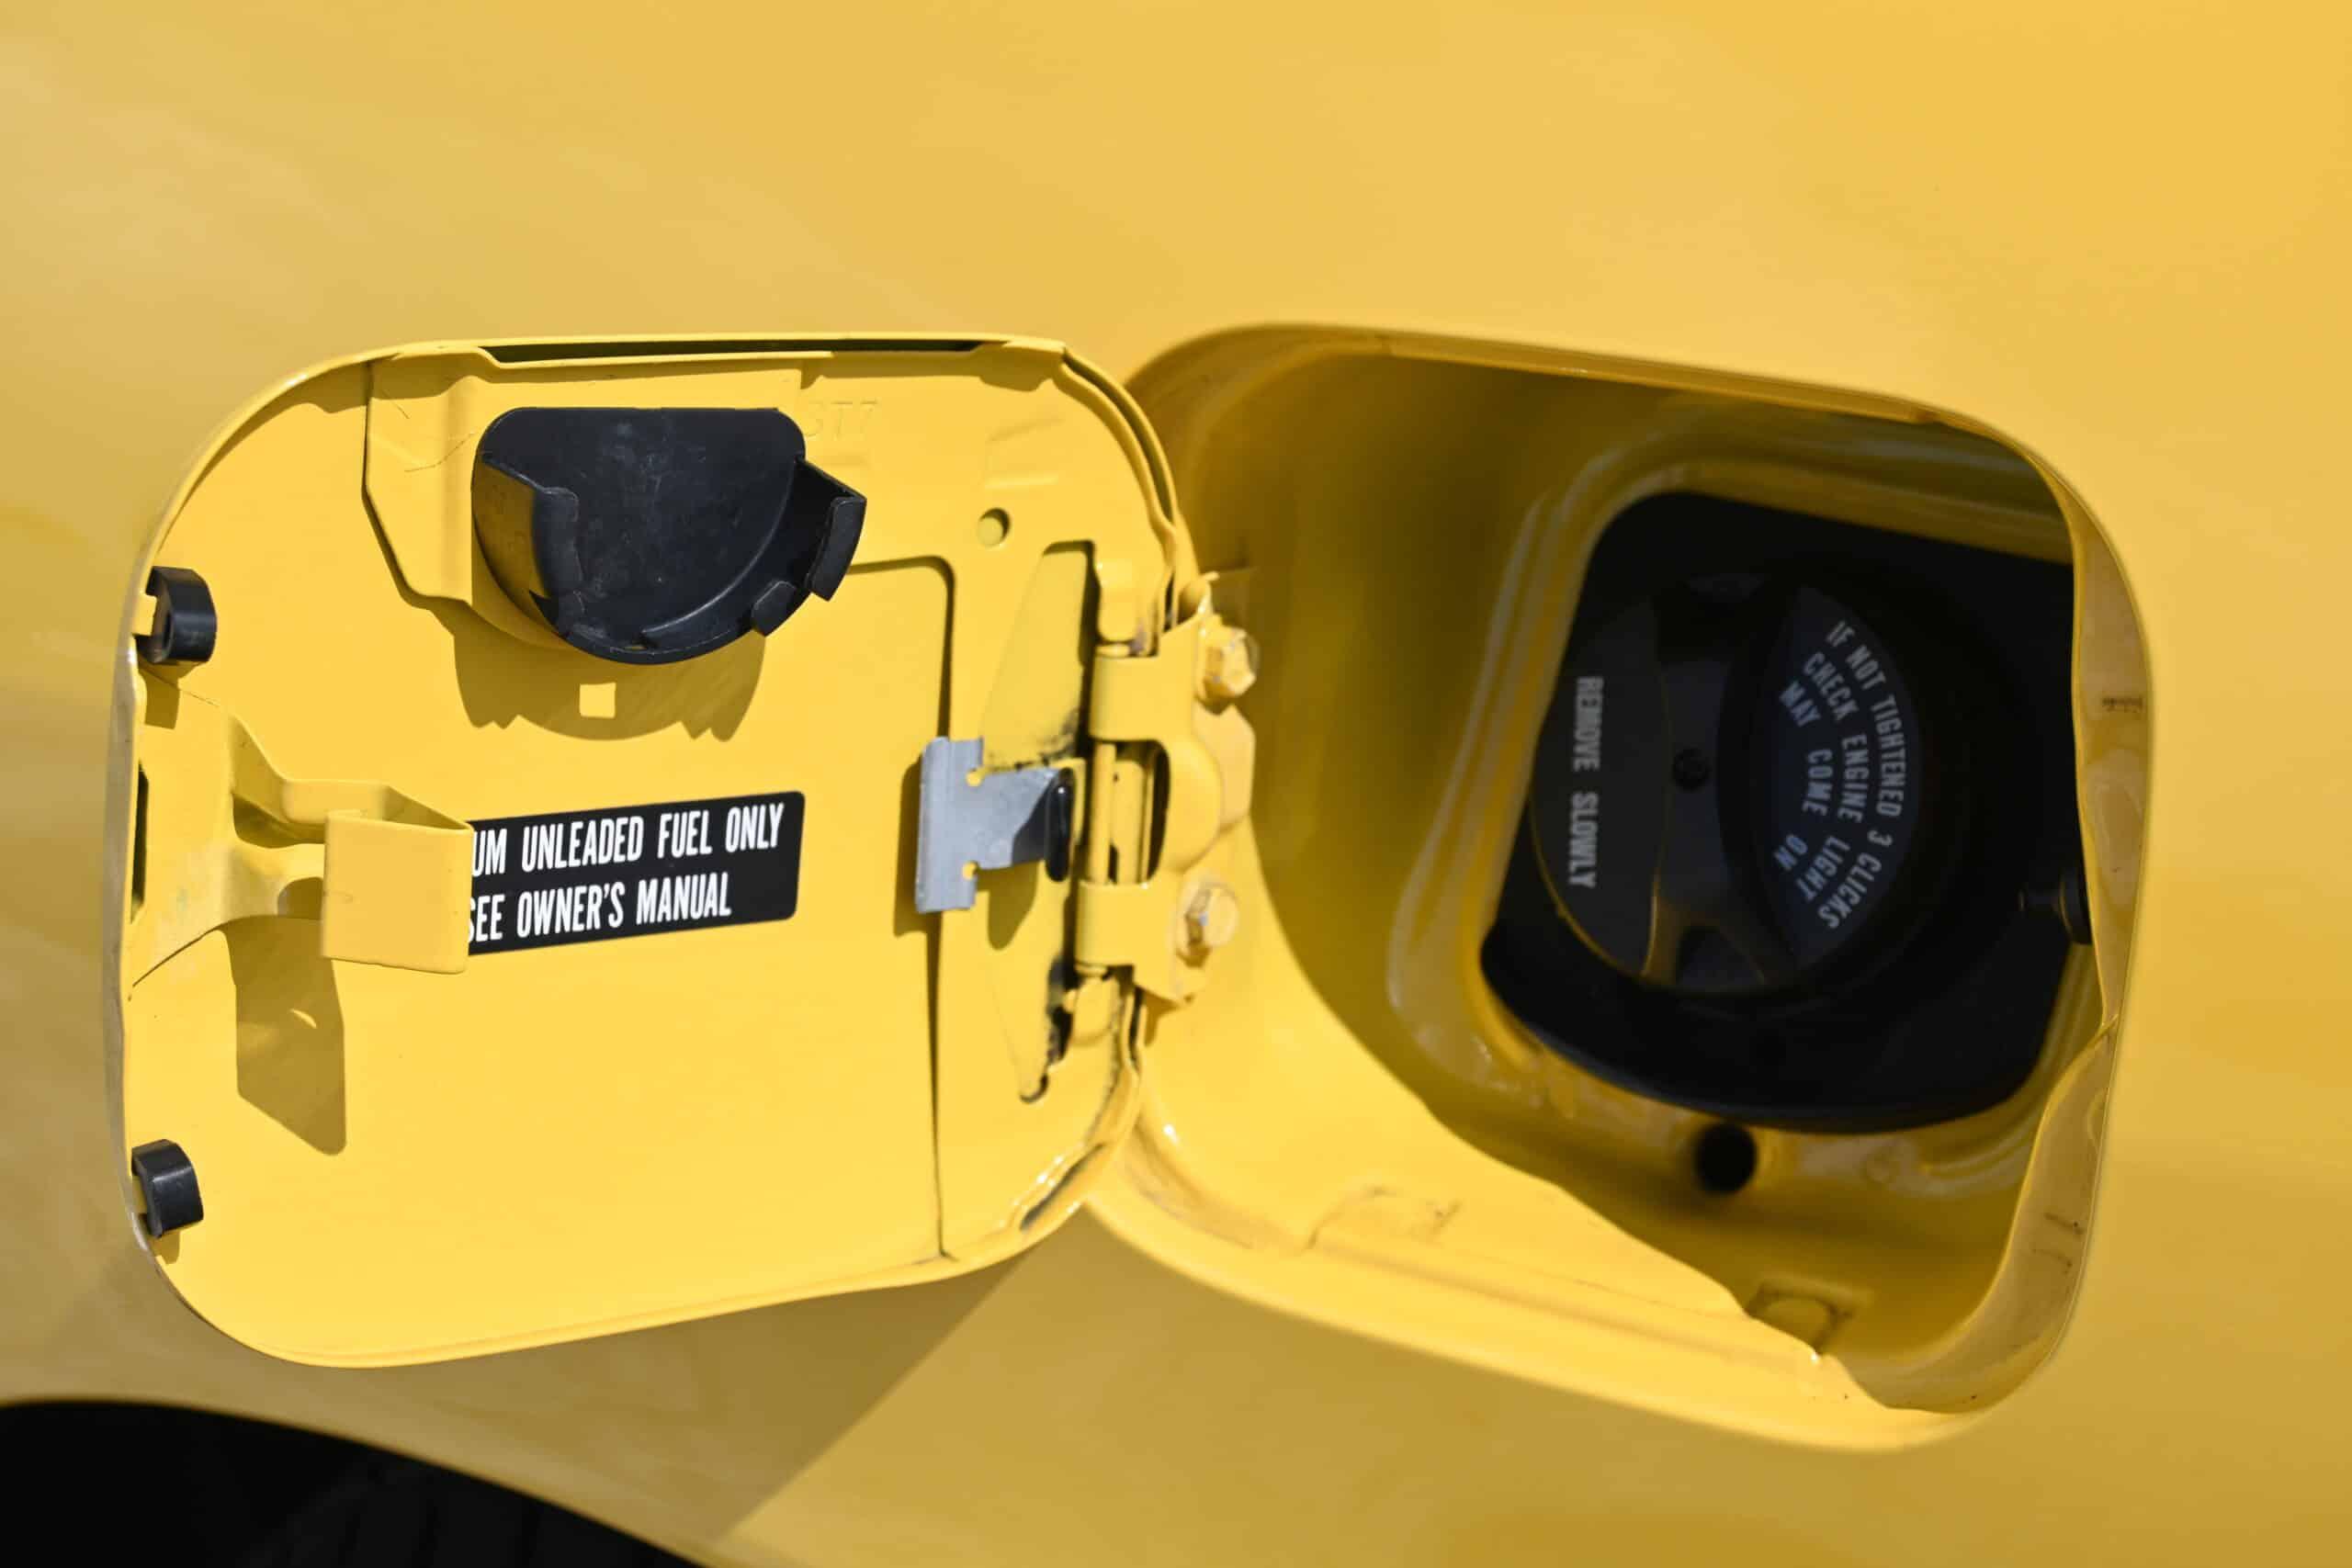 2001 Acura Integra Type R #1009 Rare Phoenix Yellow / 30K Actual Miles / 100% Stock / Clean history / Like NEW!